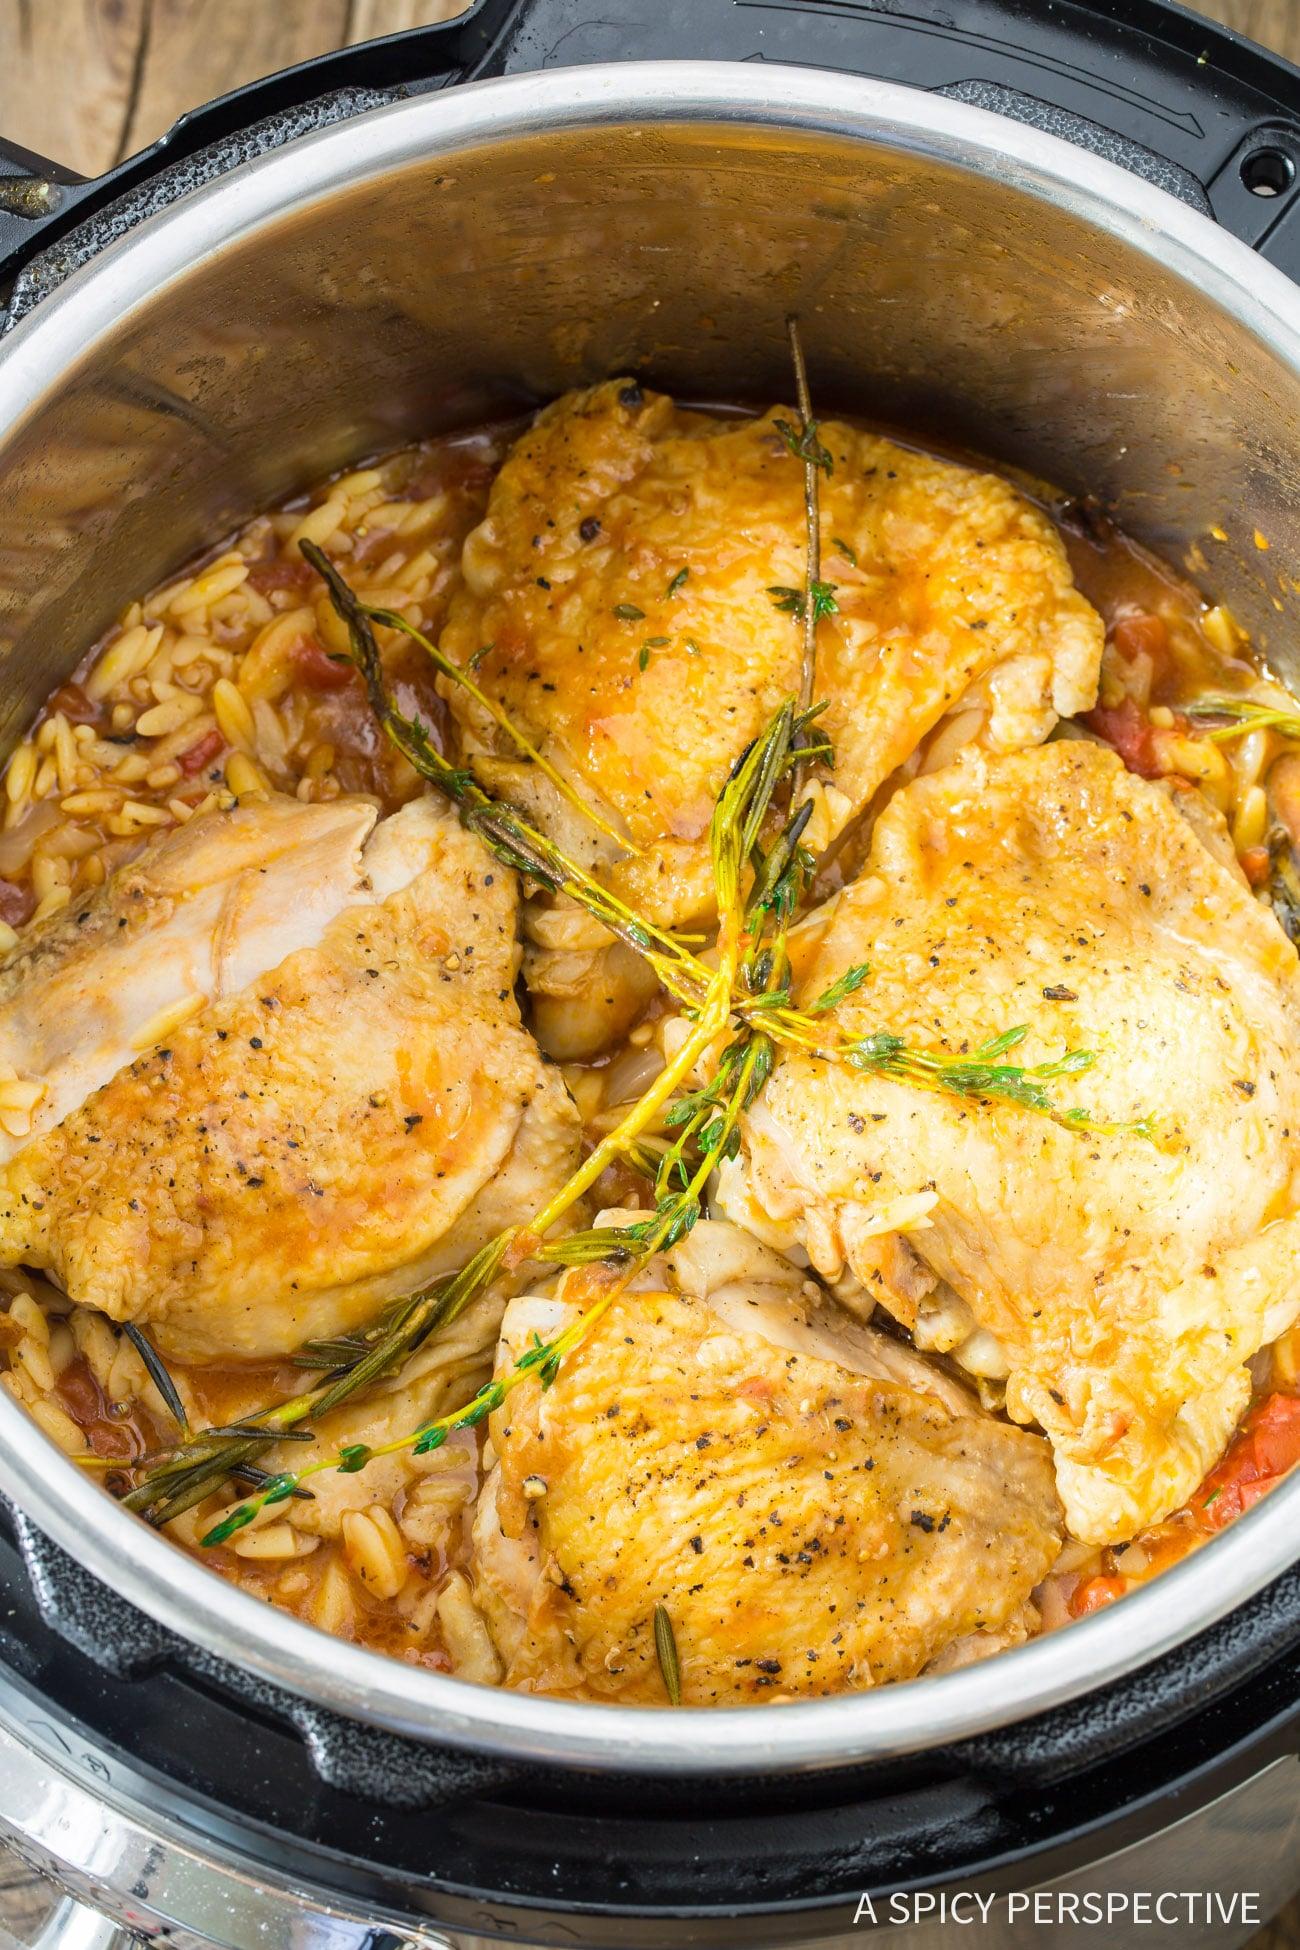 Prepping Instant Pot Herb Chicken Orzo Recipe (Pressure Cooker Italian Pasta)